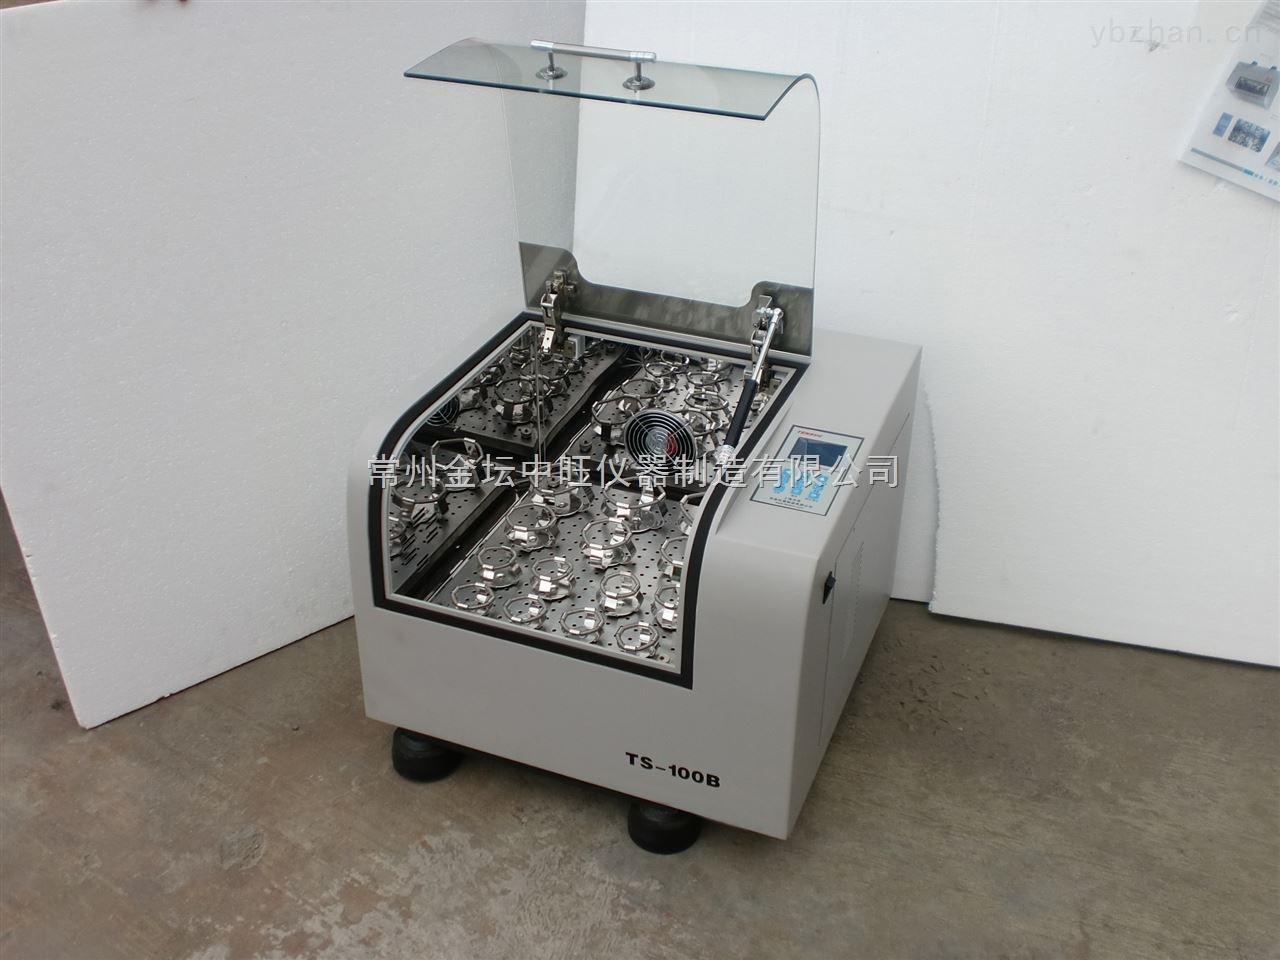 KYC-100B--台式恒温摇床厂家